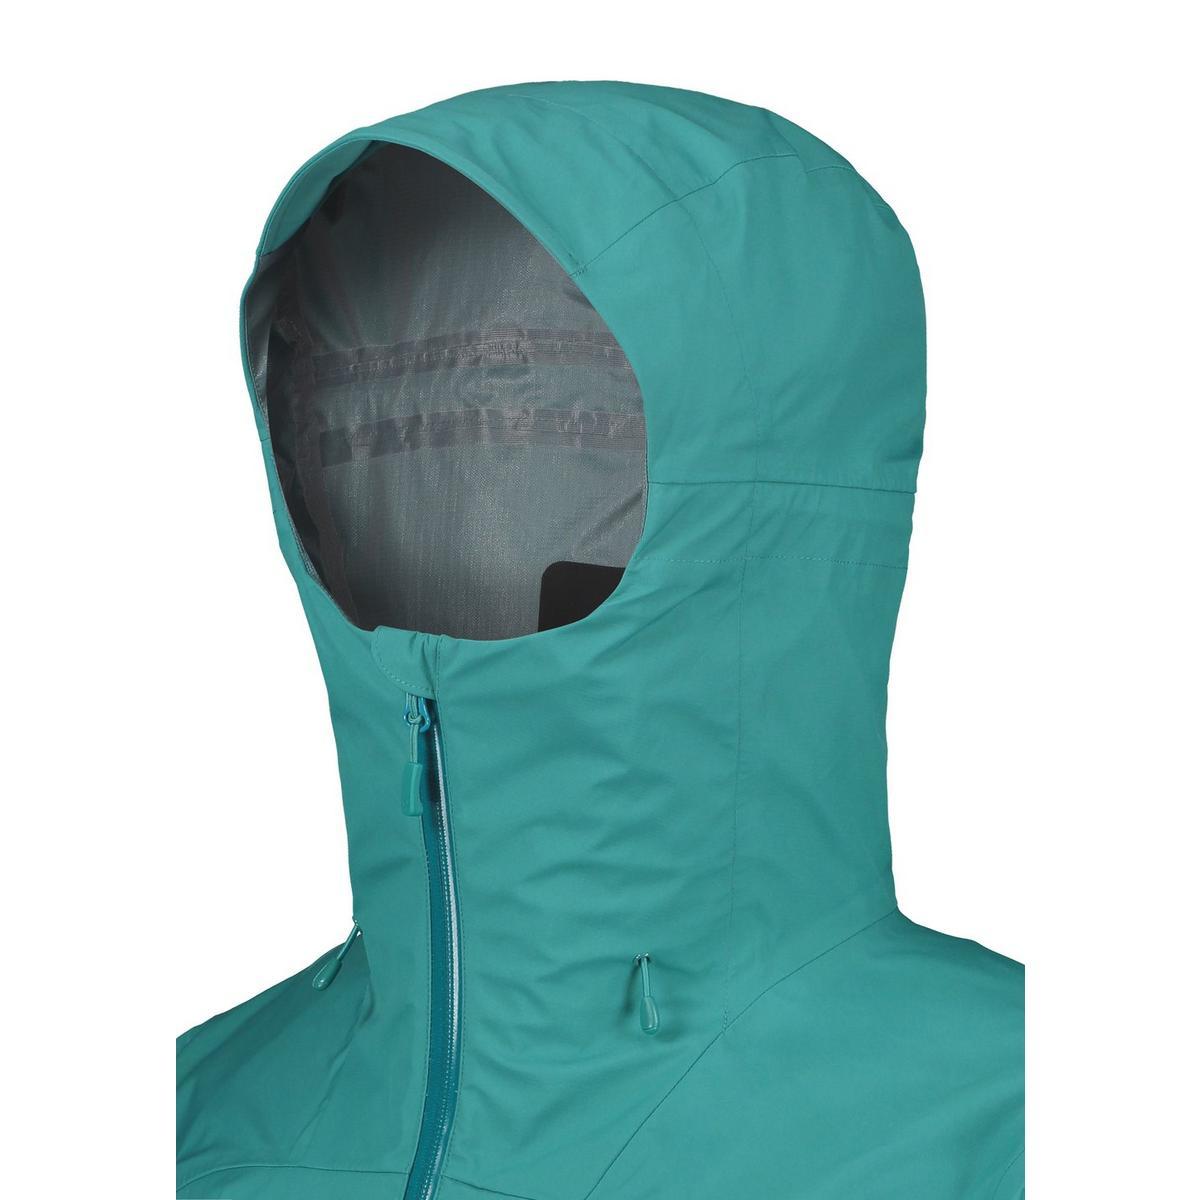 Rab Women's Arc Eco Jacket - Storm Green